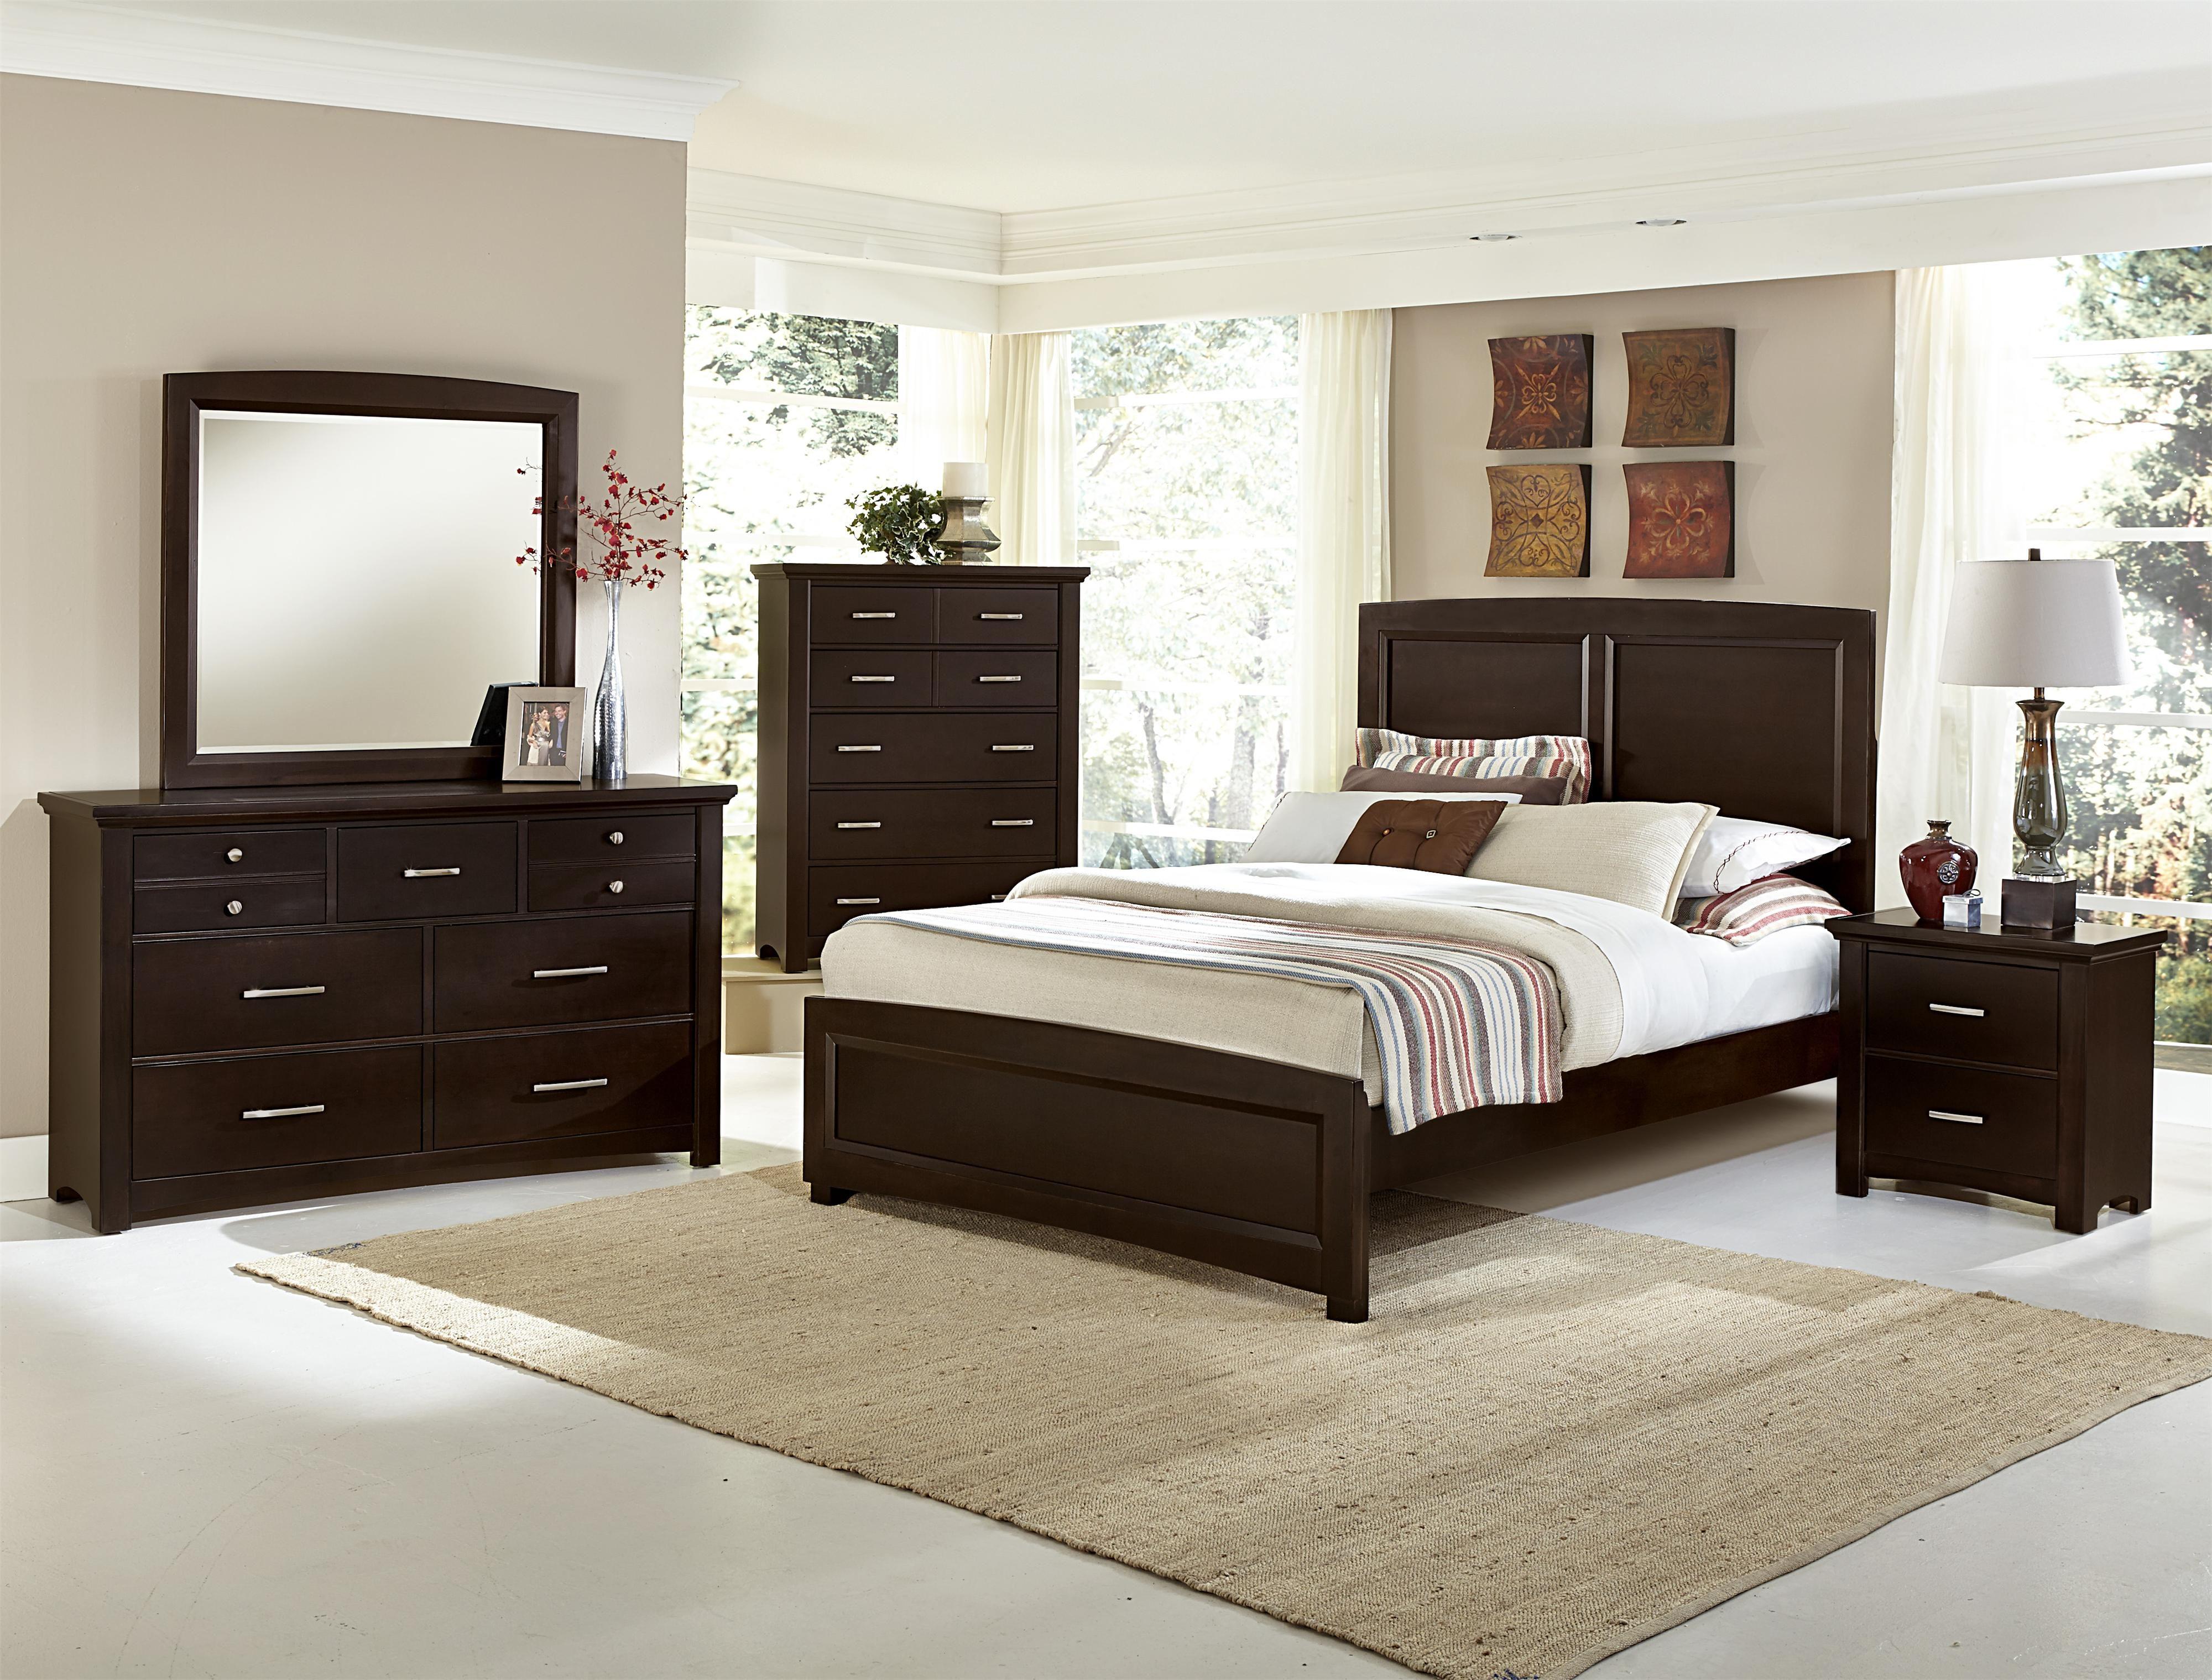 Best Transitions Queen Bedroom Group By Vaughan Bassett 640 x 480